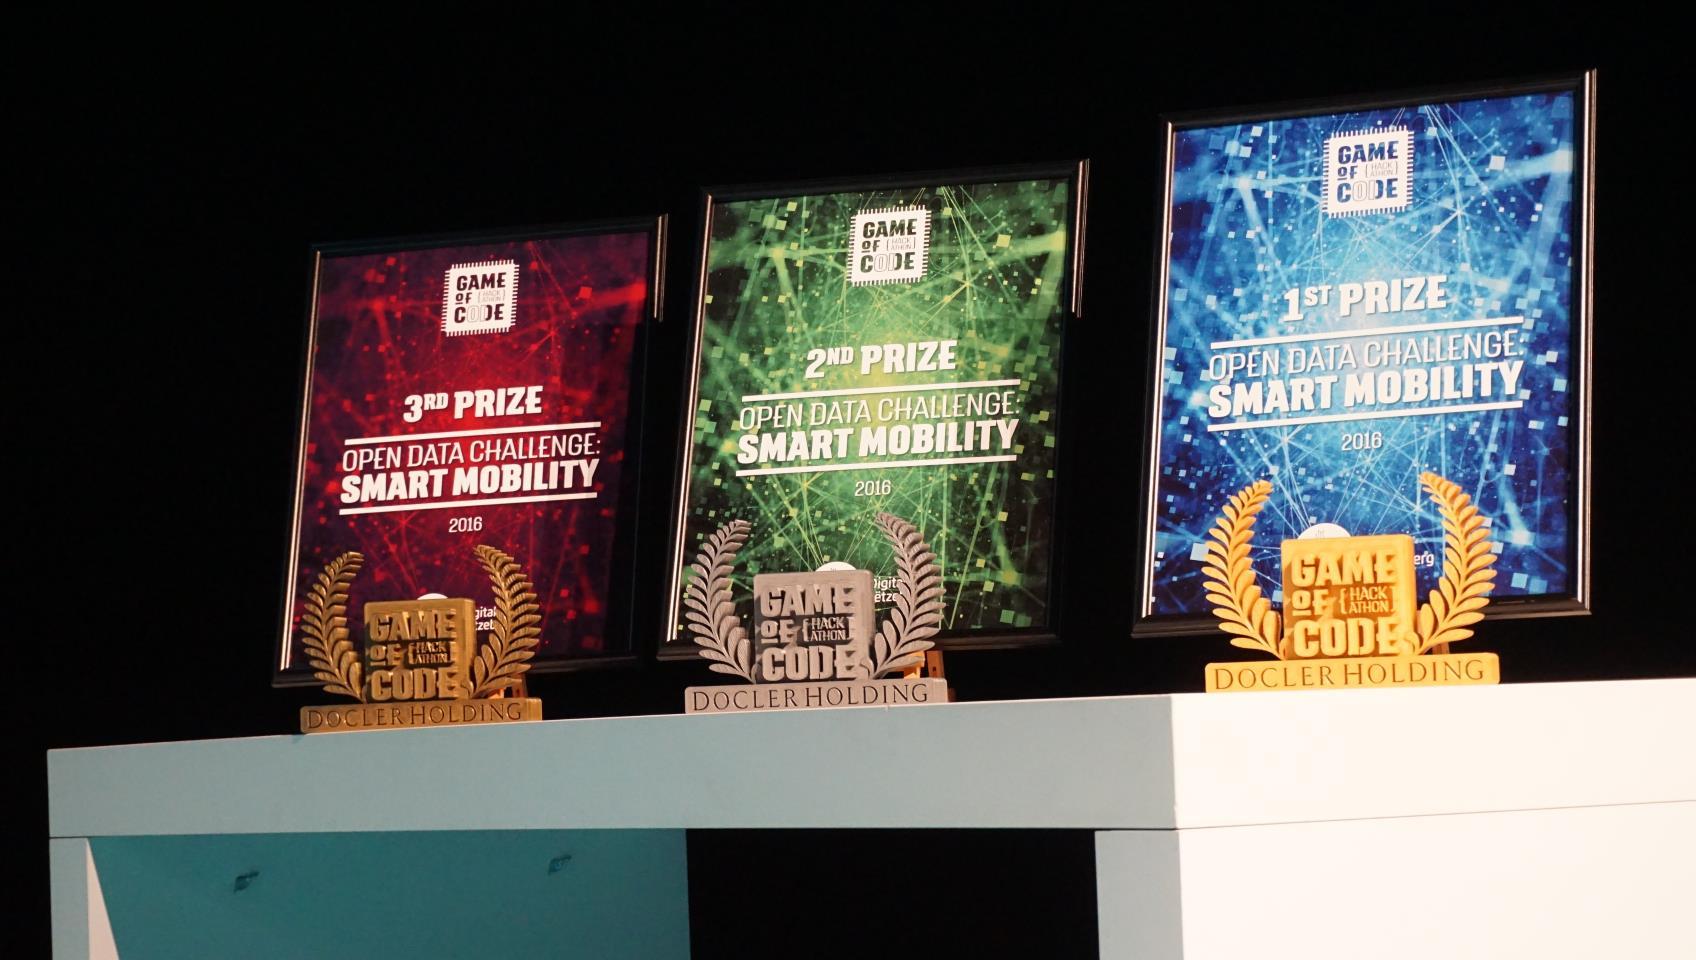 GameOfCode_prix